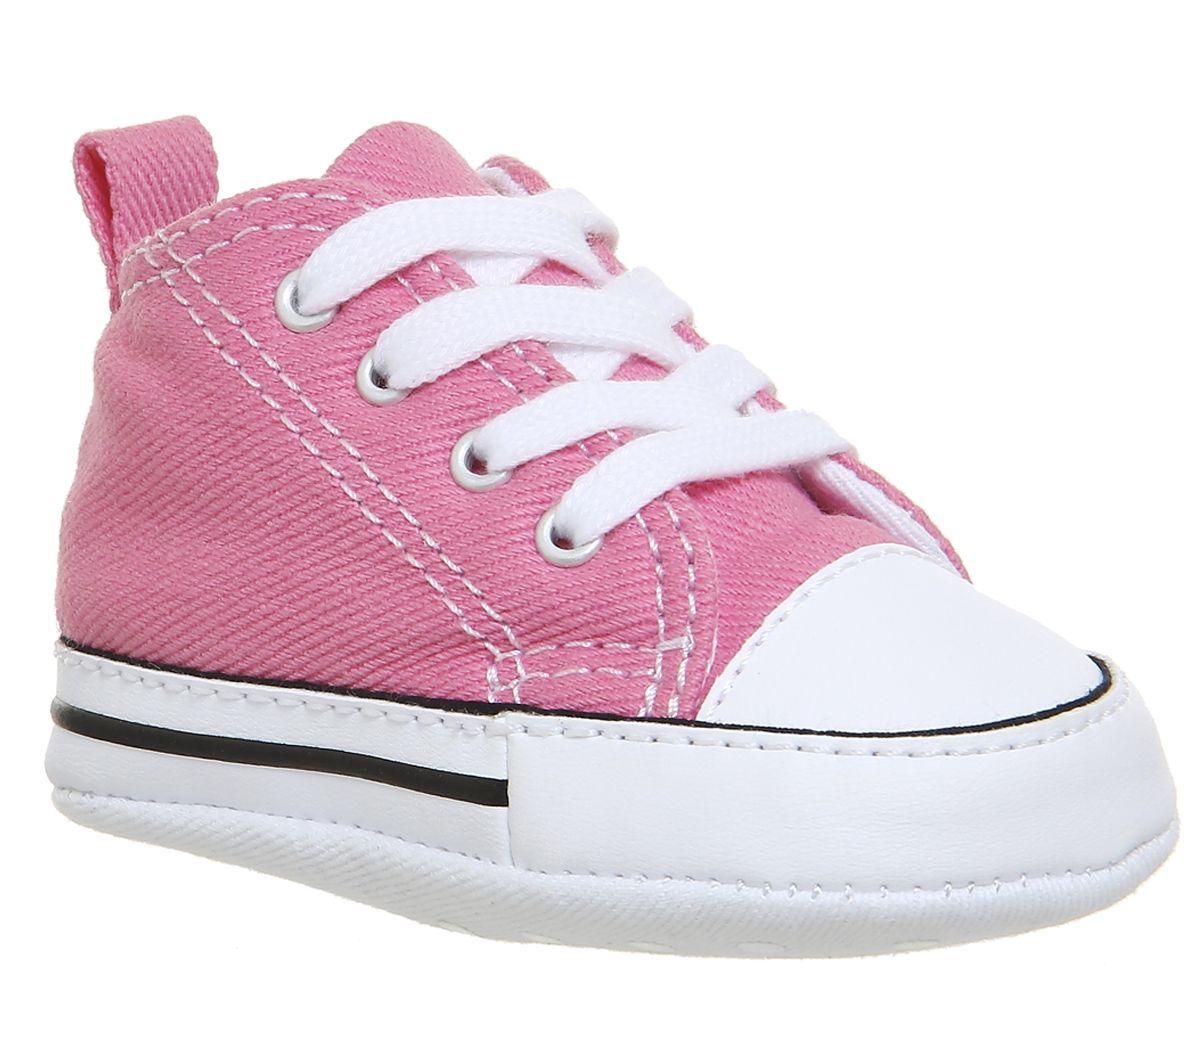 25008b4b4f60 Converse First Star Pink Canvas - Unisex